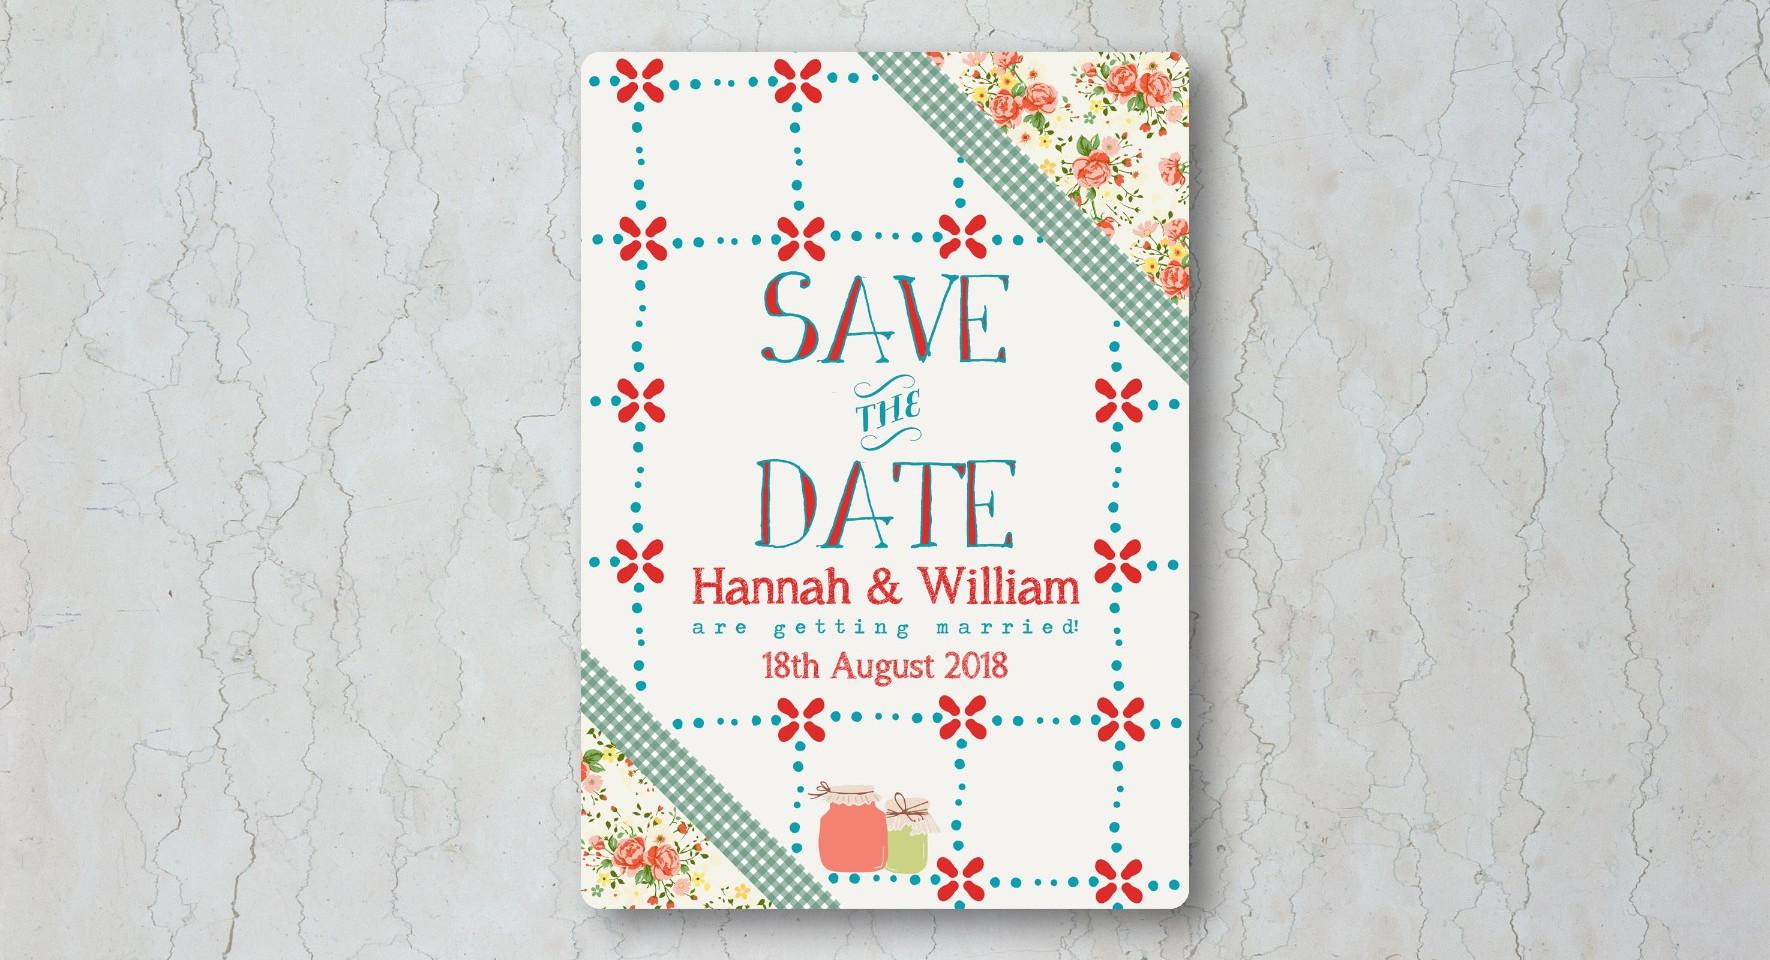 Summer Picnic Save the Date Wedding Invi